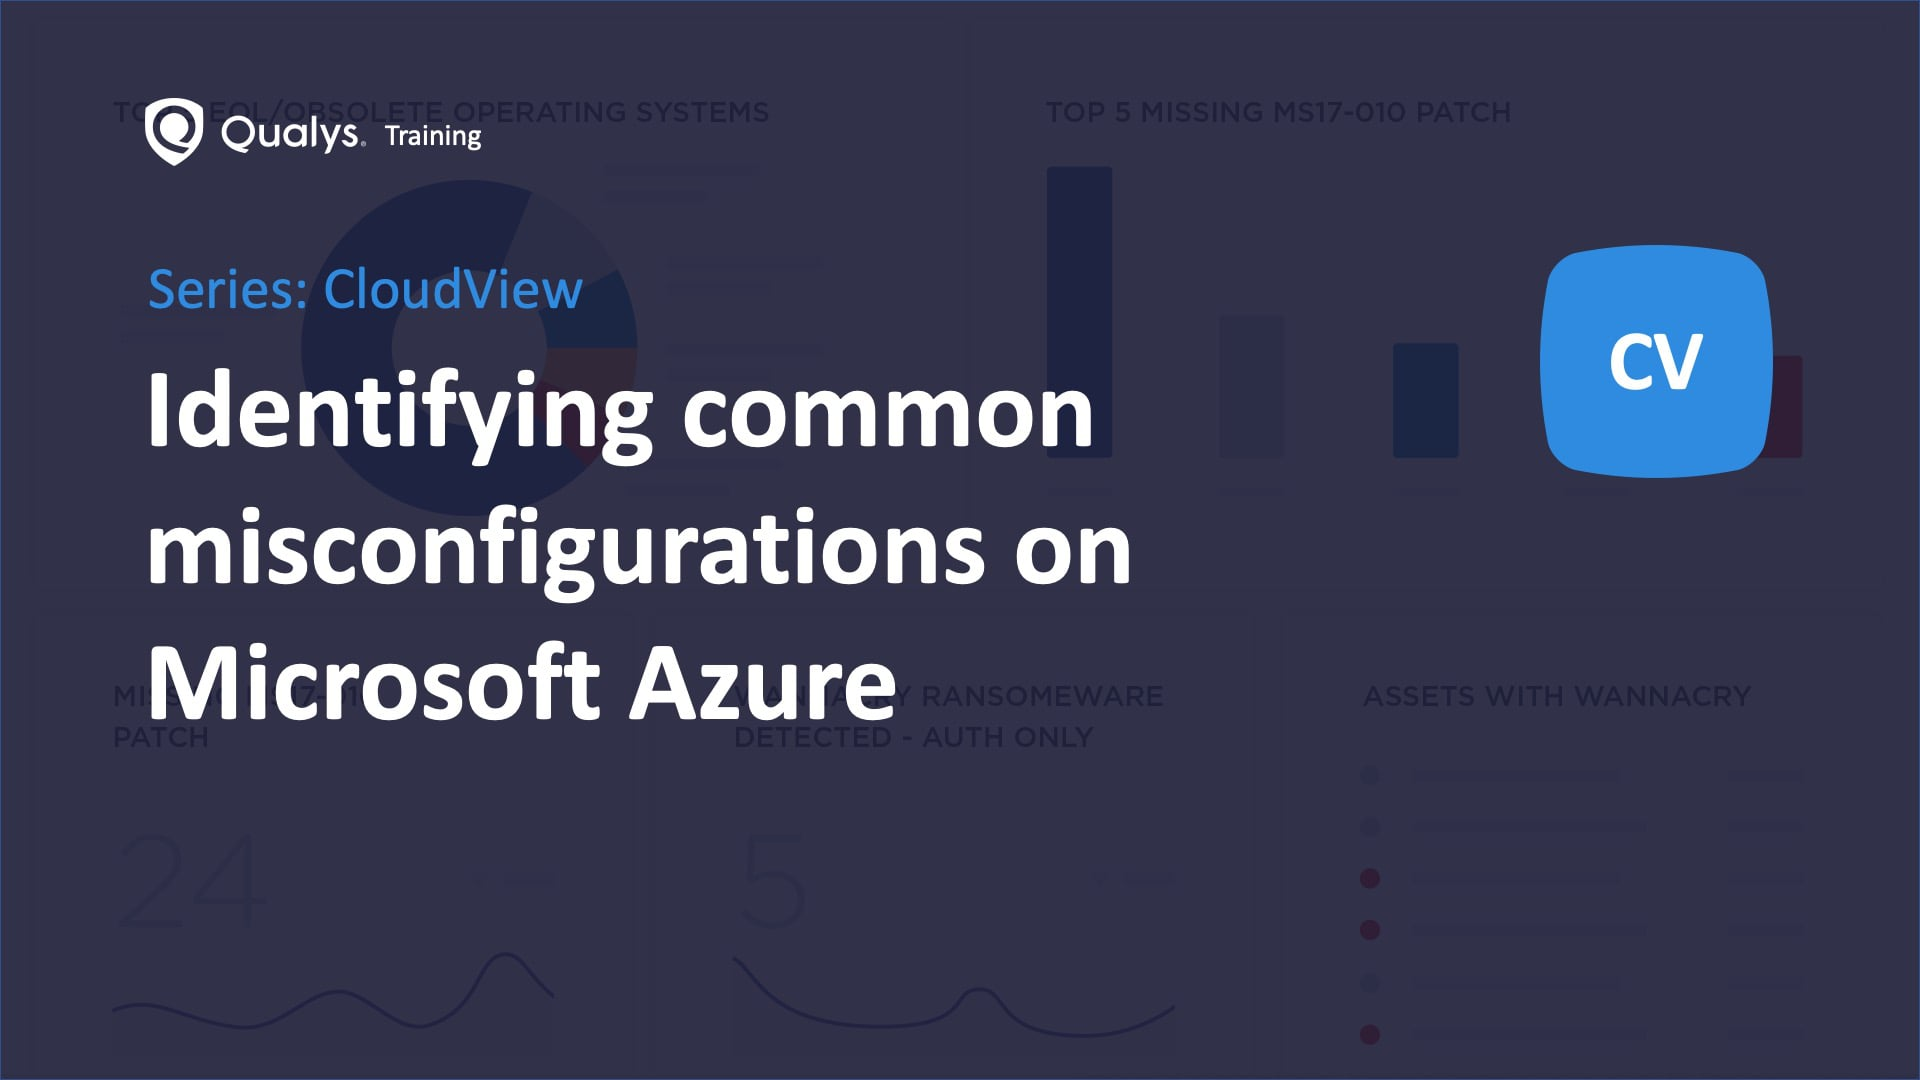 Identifying common misconfigurations on Microsoft Azure